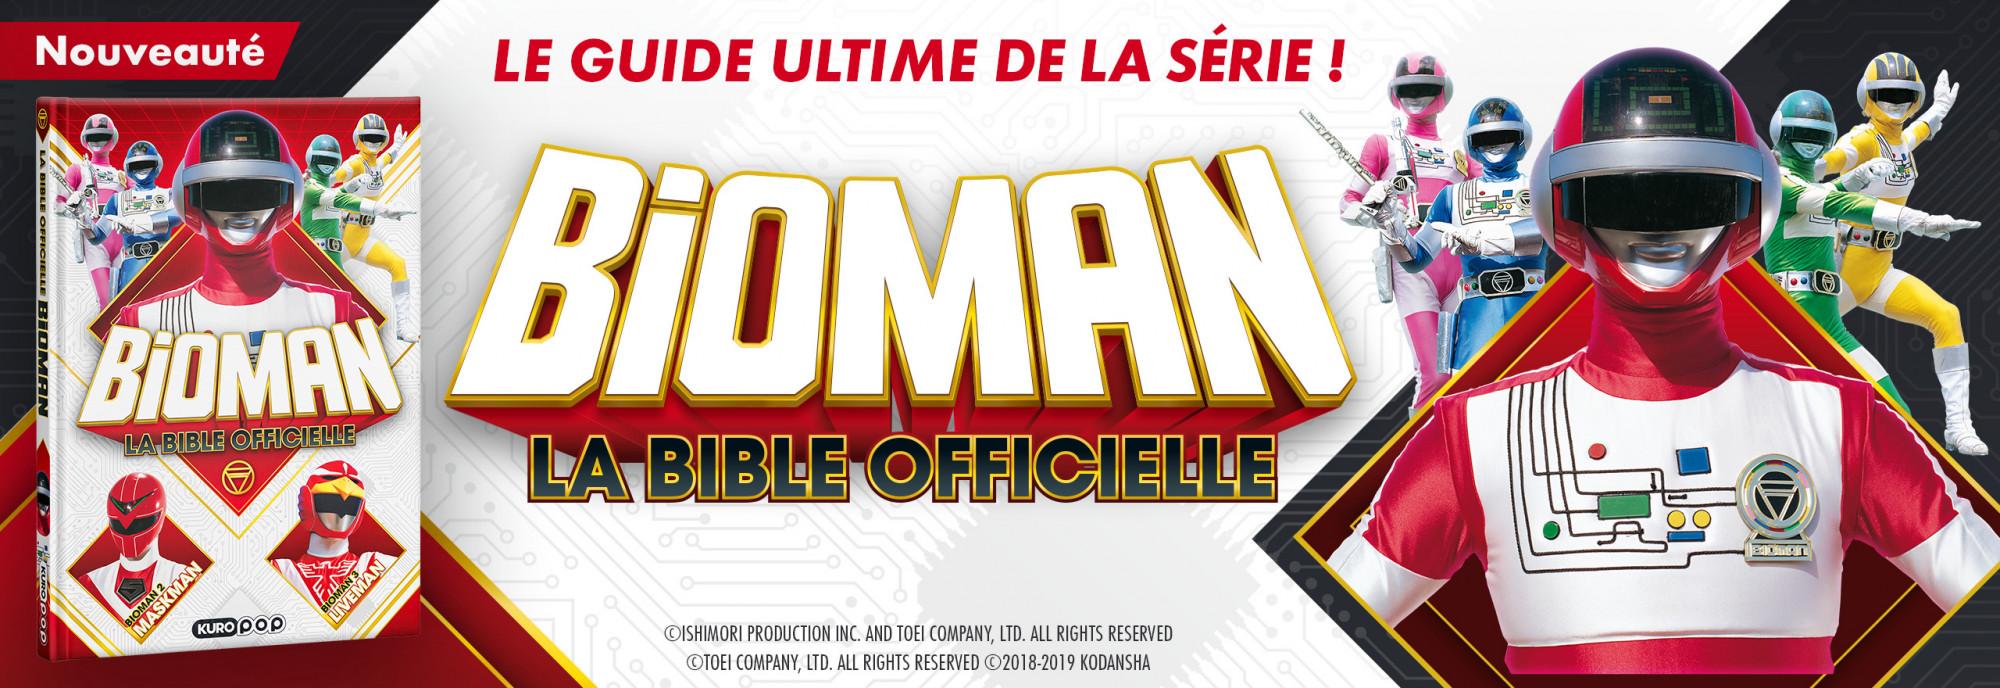 7542_1_Bioman-Visuel-Lisez-N0-Desktop-1280x440-2x.jpg